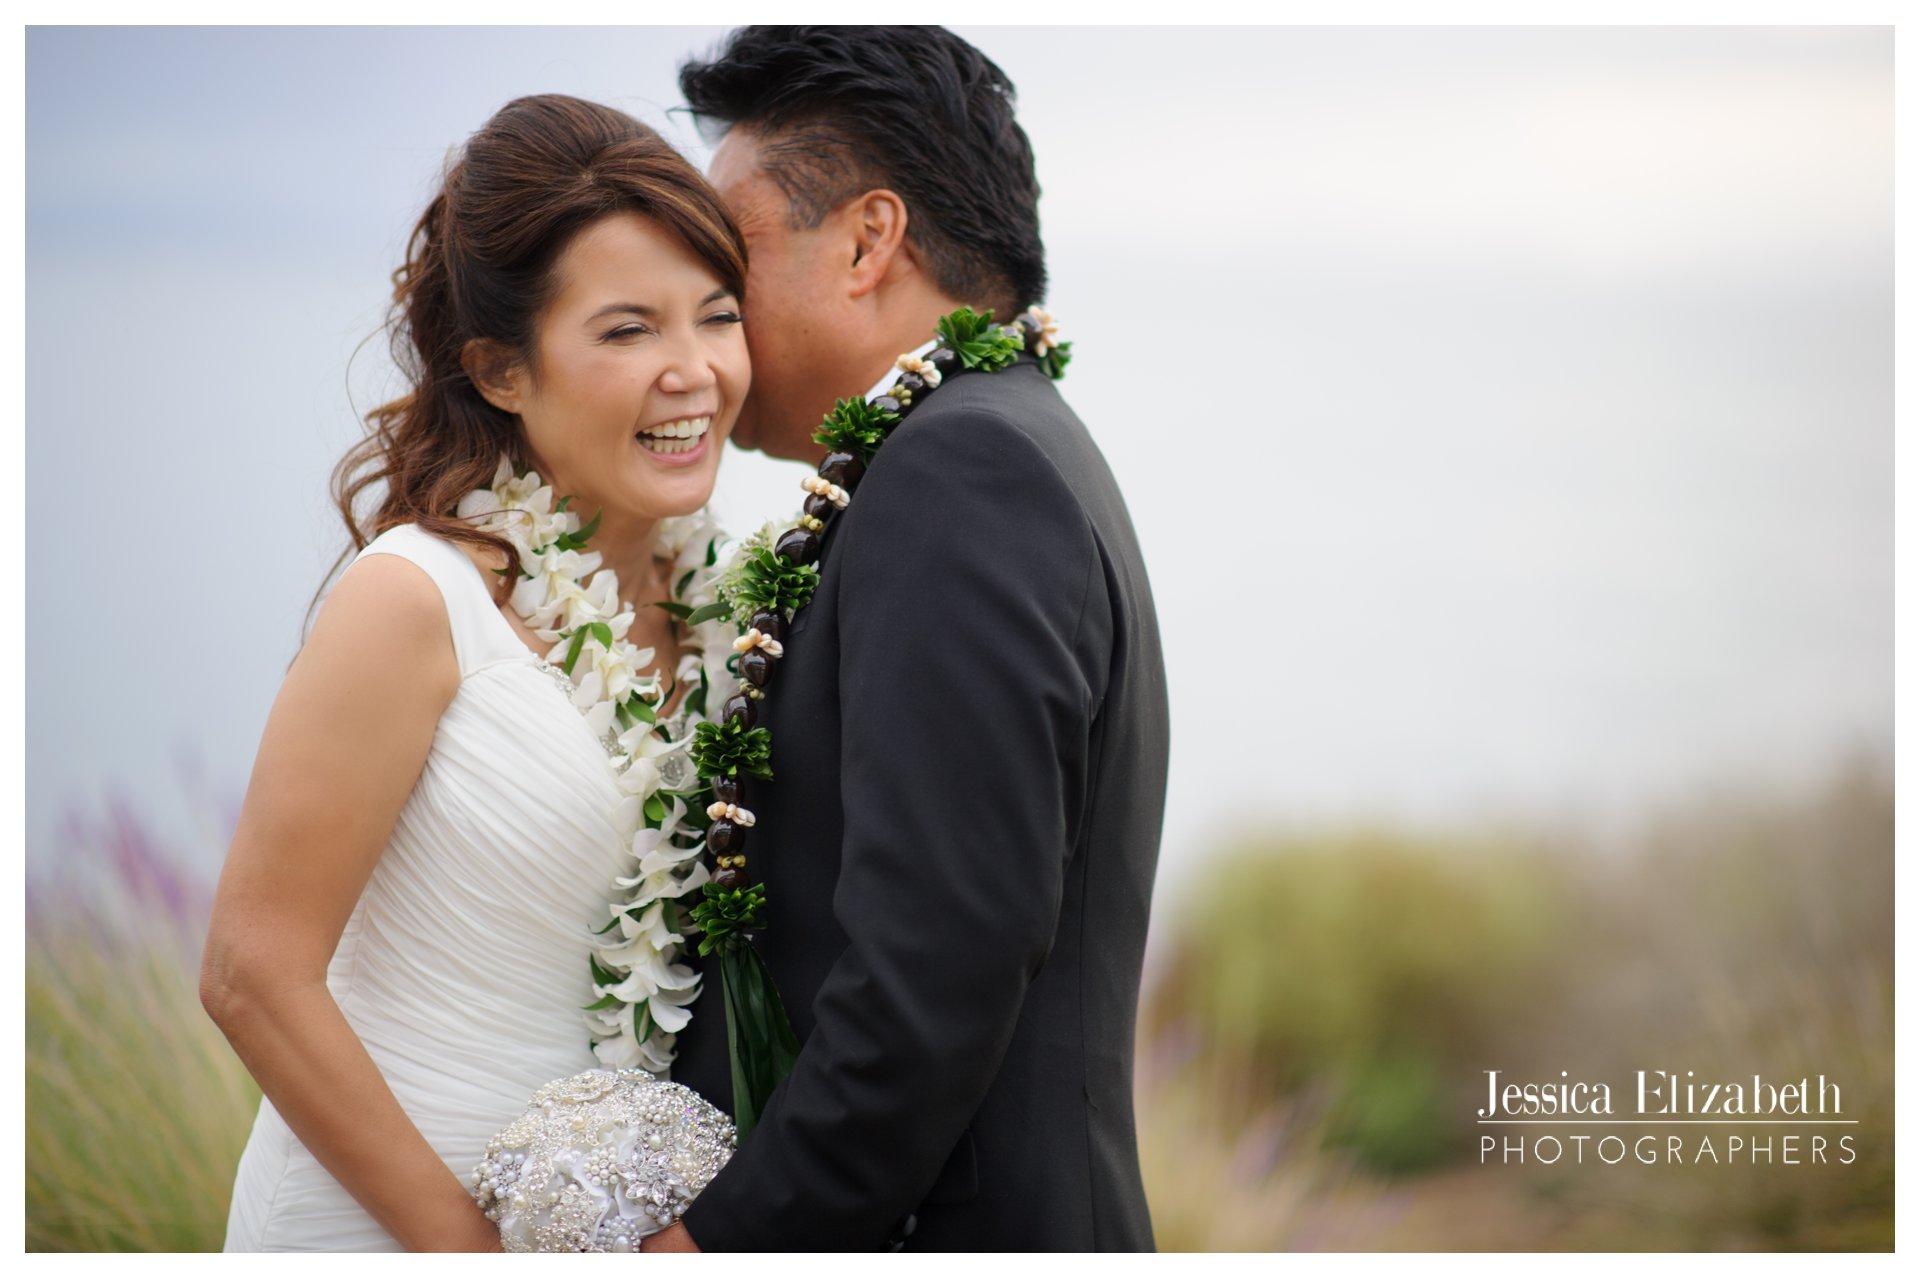 32-Terranea-Palos-Verdes-Wedding-Photography-by-Jessica-Elizabeth-w.jpg